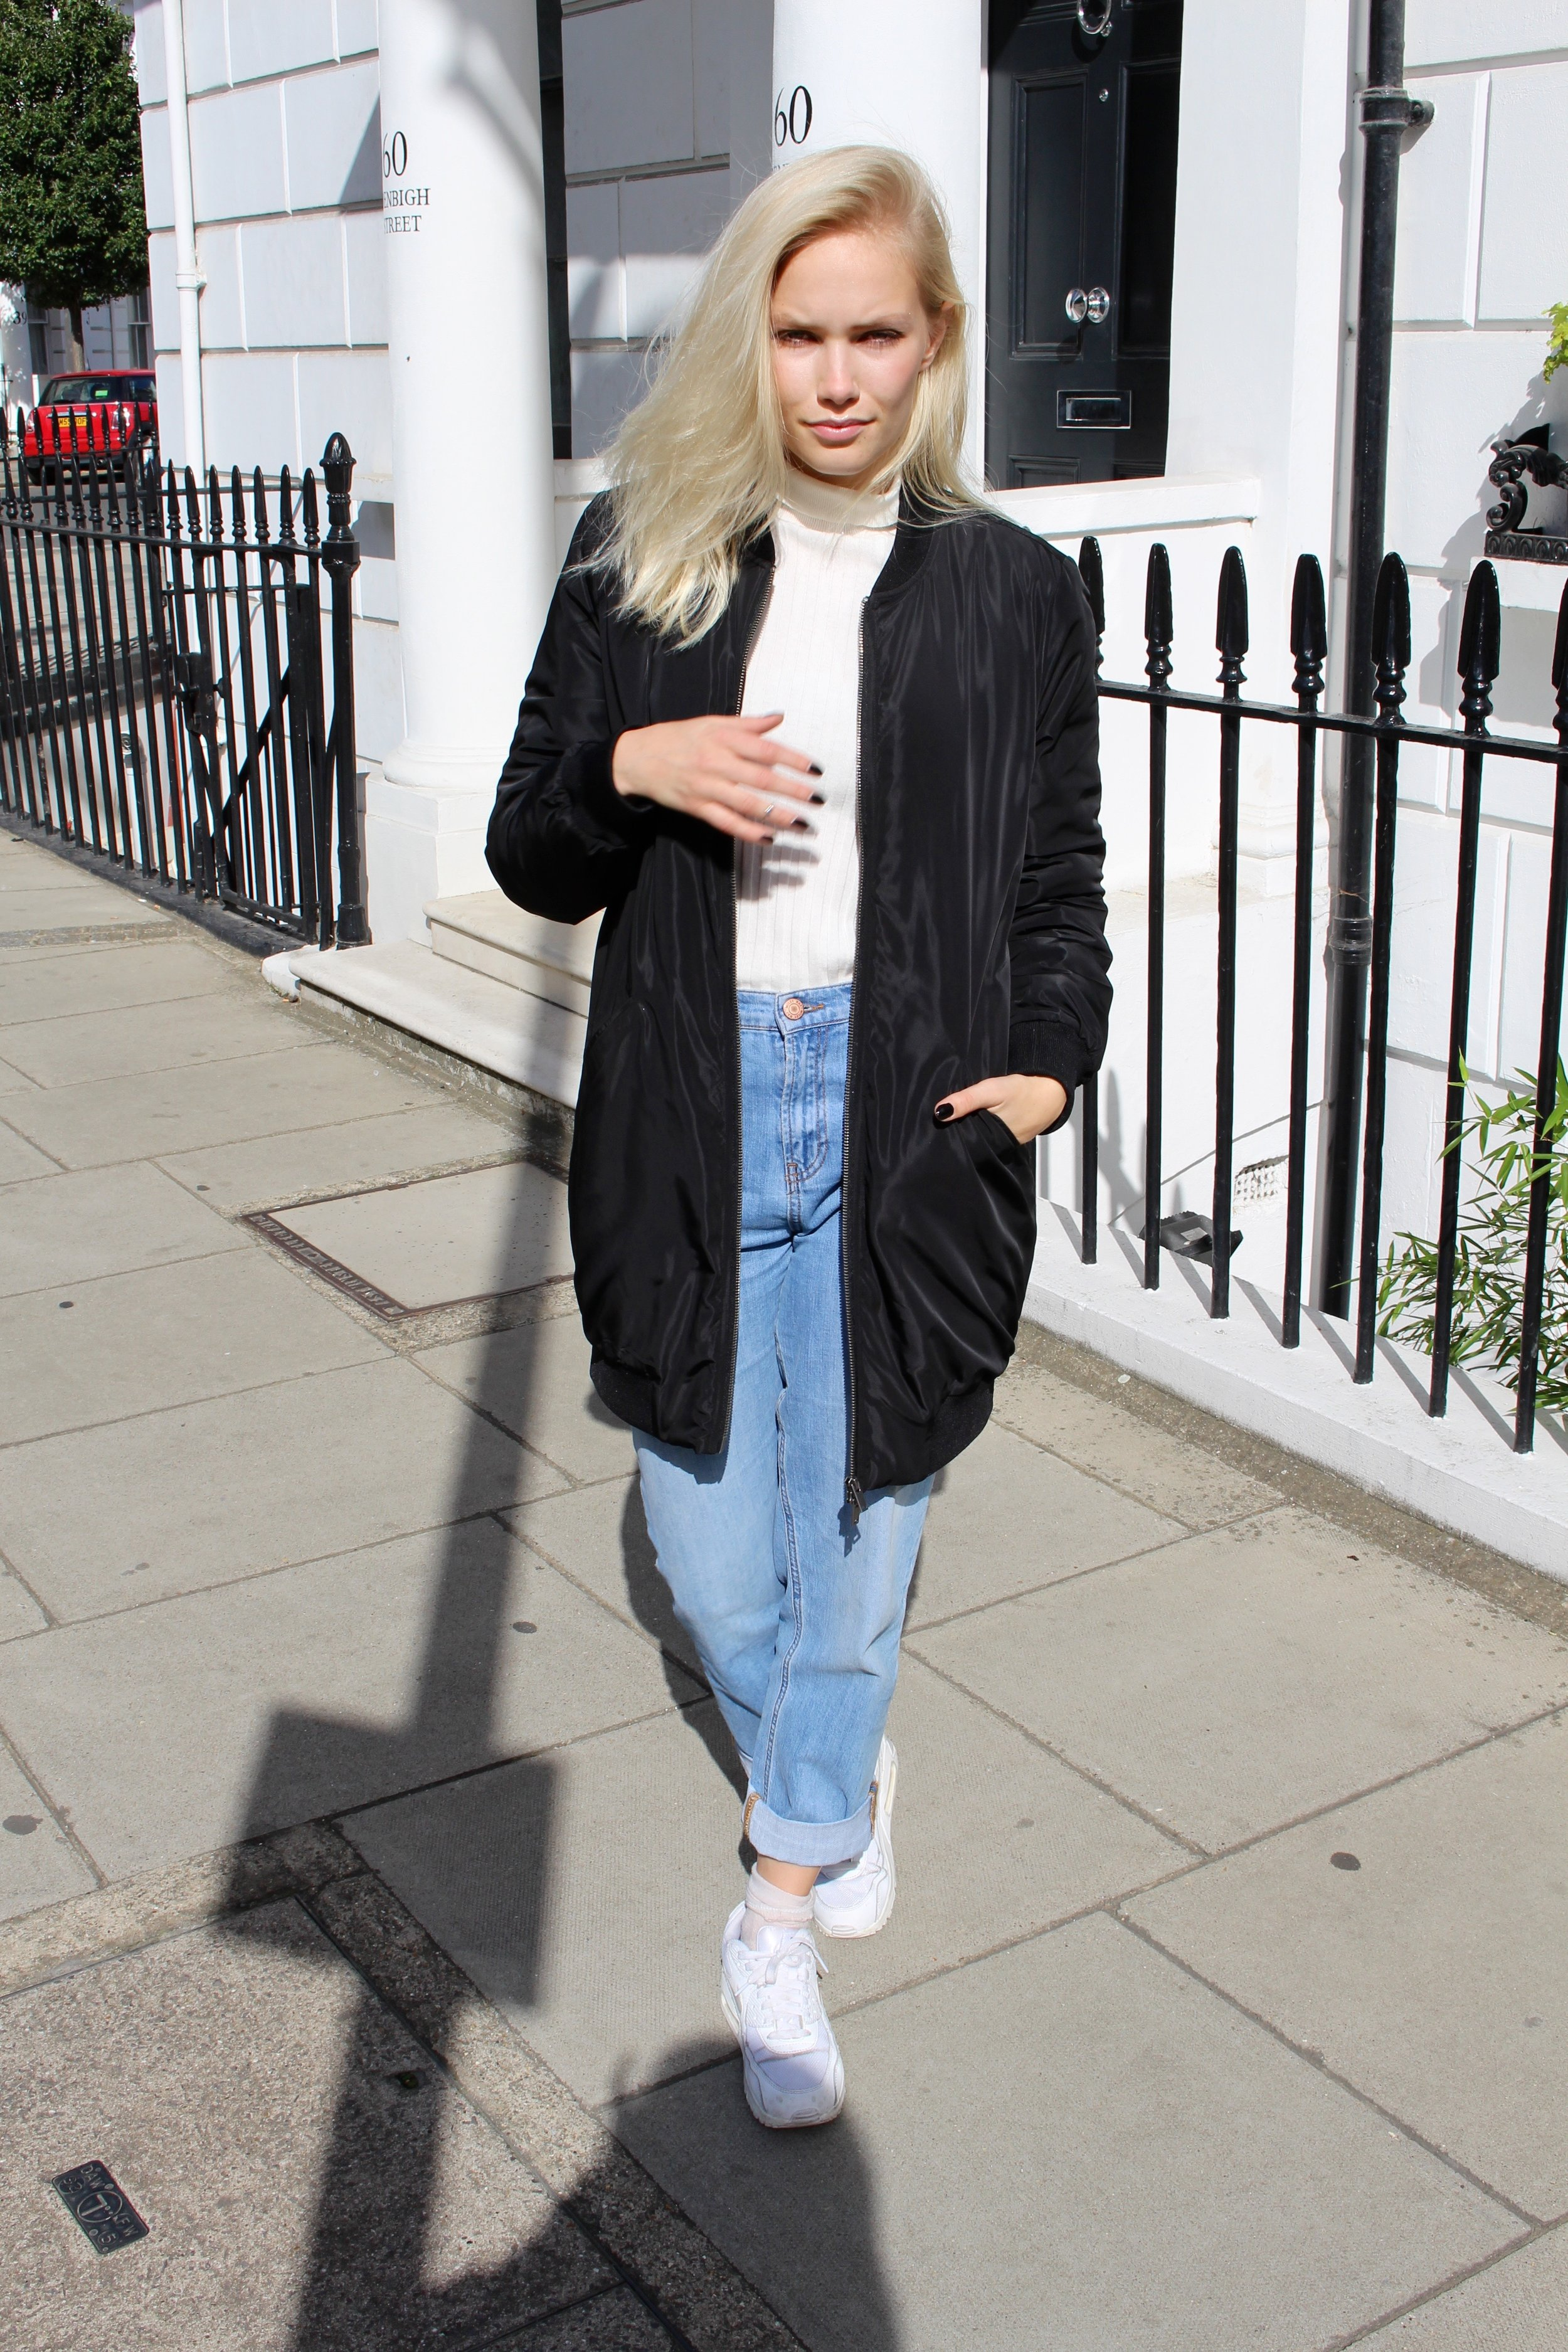 Jacket from   Object  and jeans from   Noisy May - Vero Moda